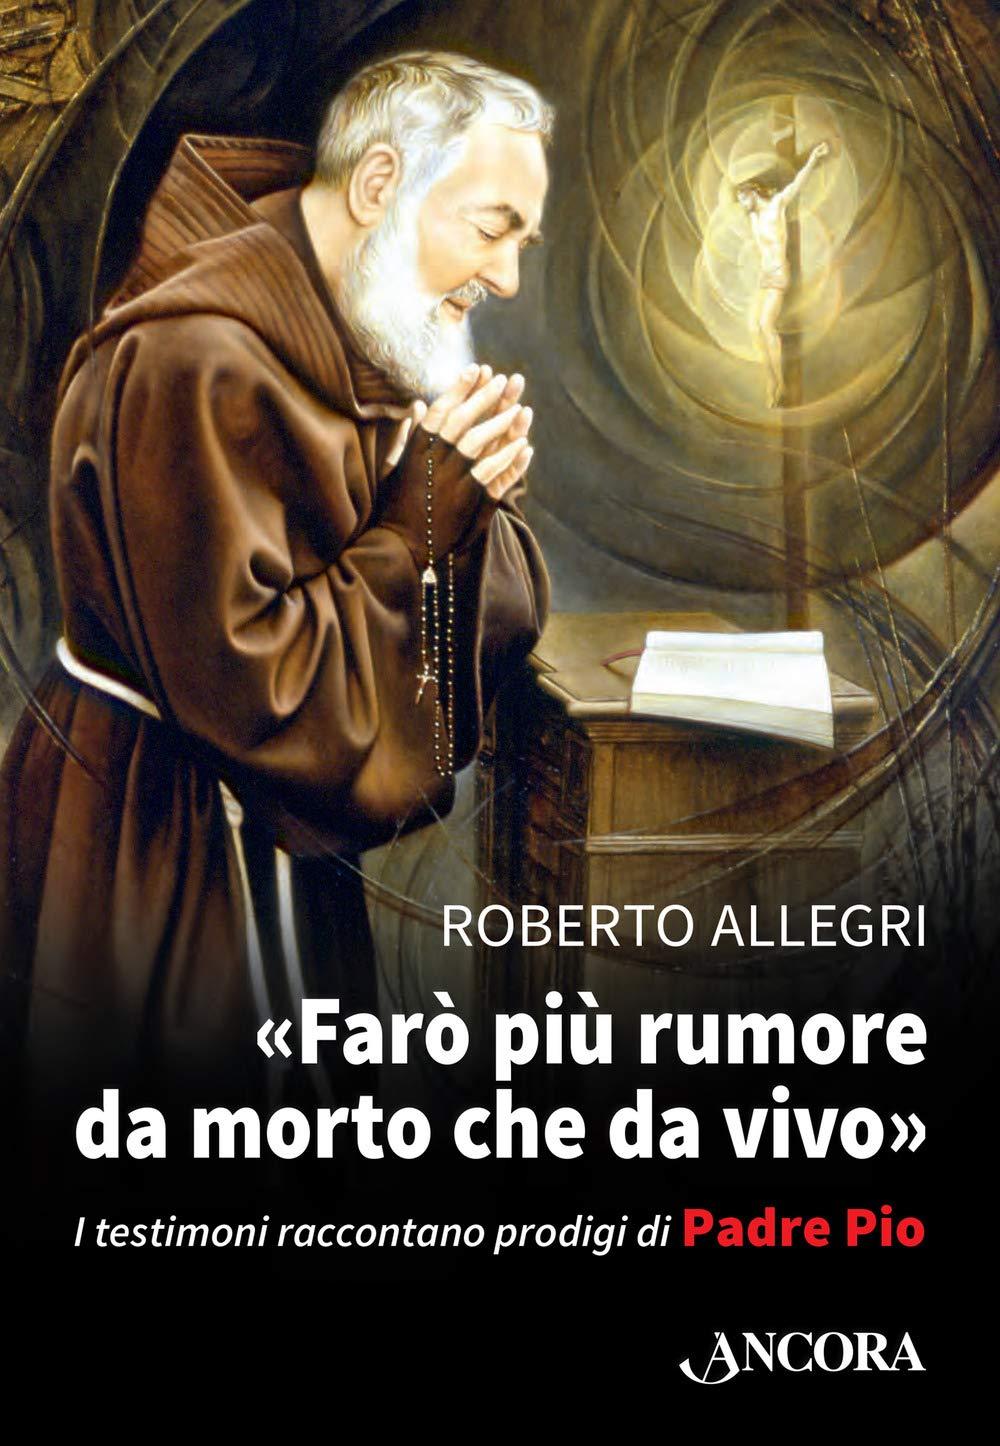 Roberto Allegri